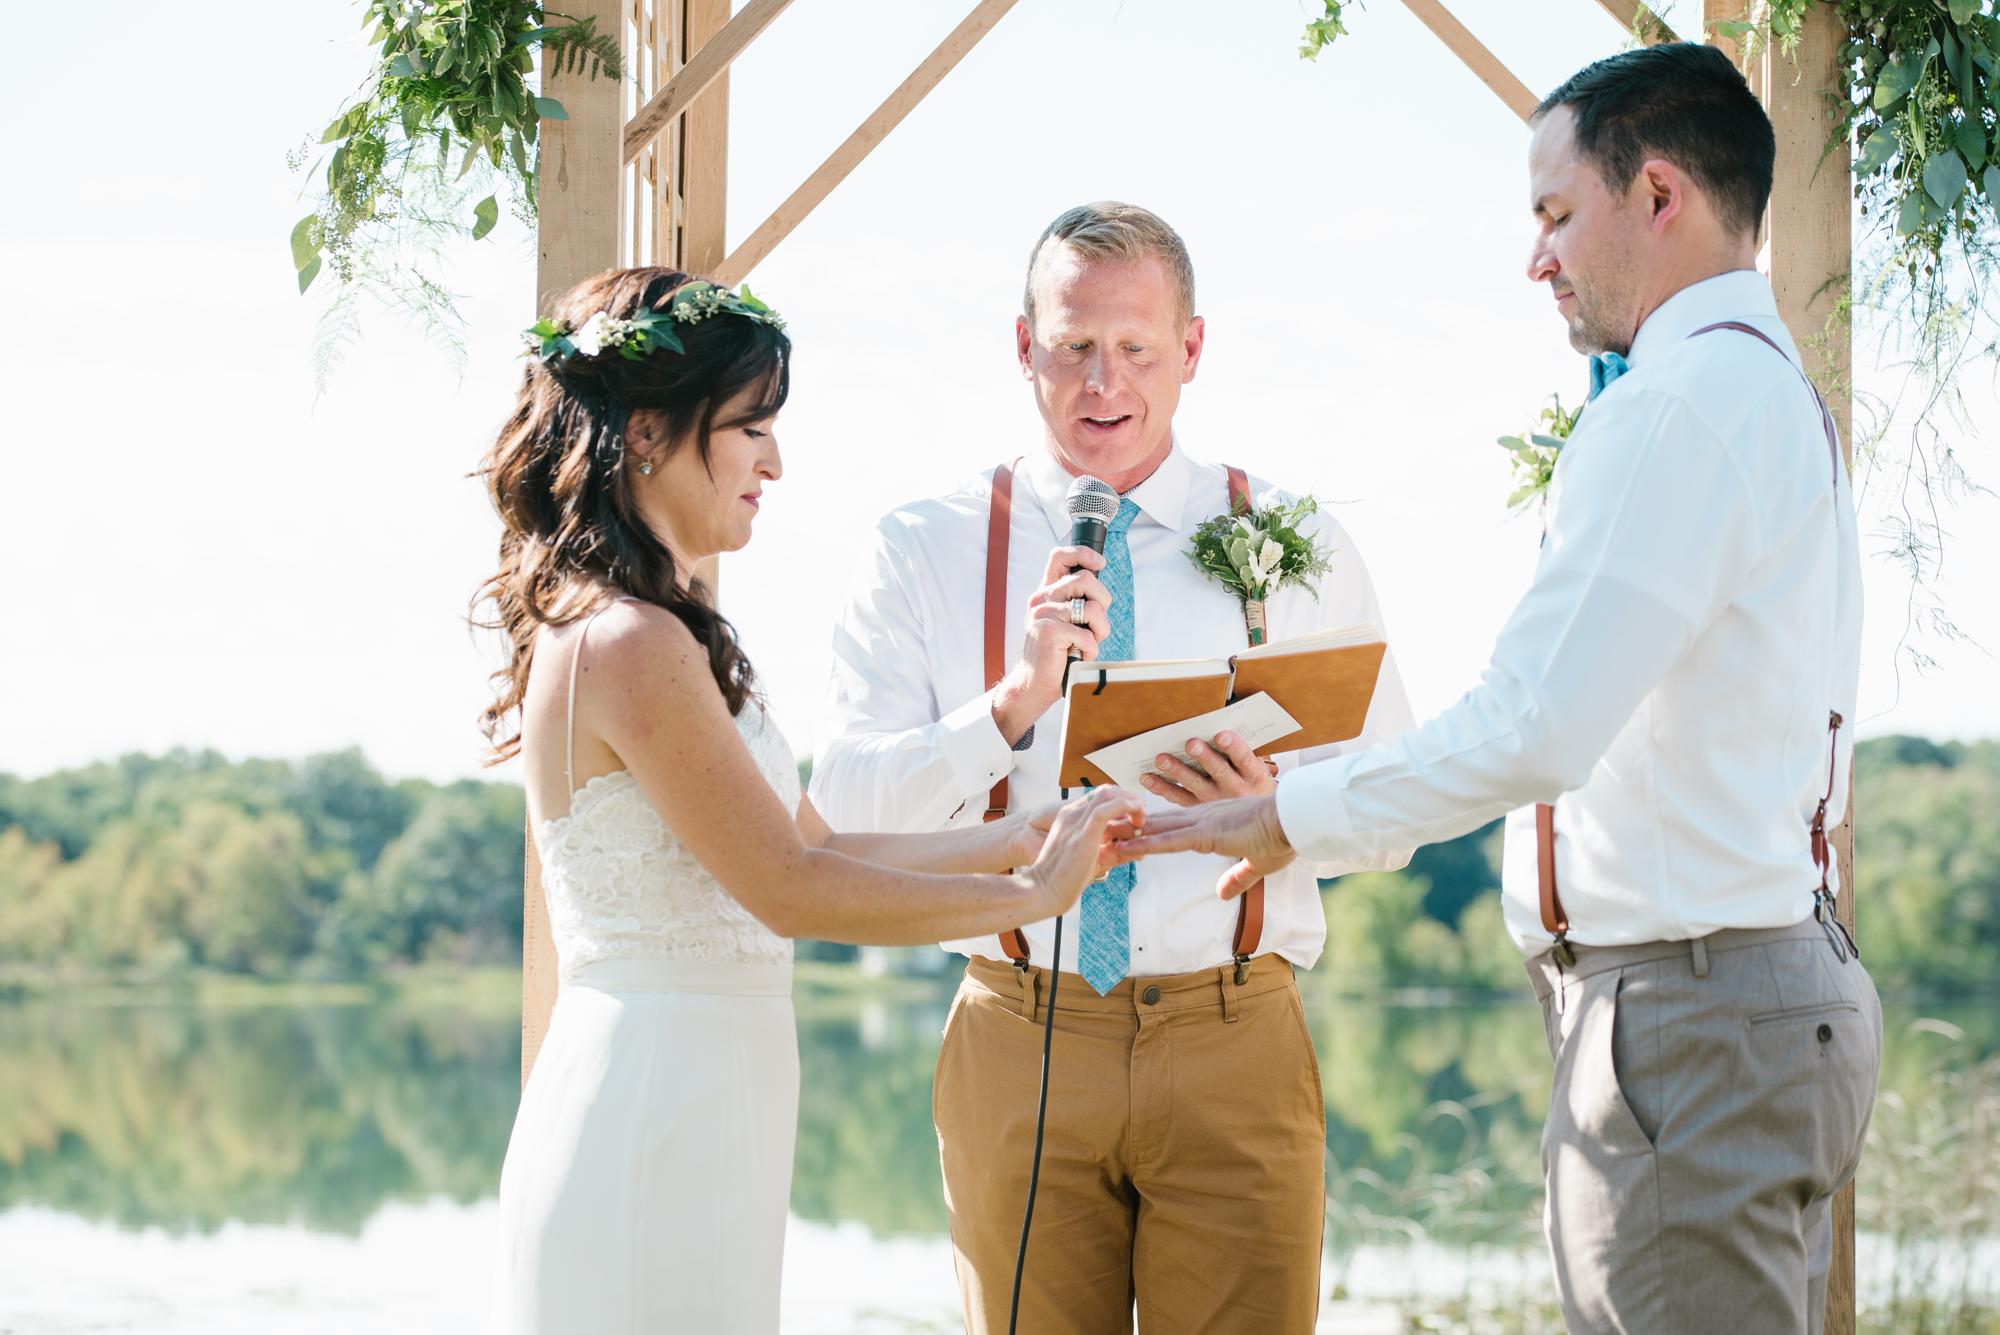 Quincy-Coldwater-Michigan-farm-wedding-photogapher-sydney-marie (186).jpg